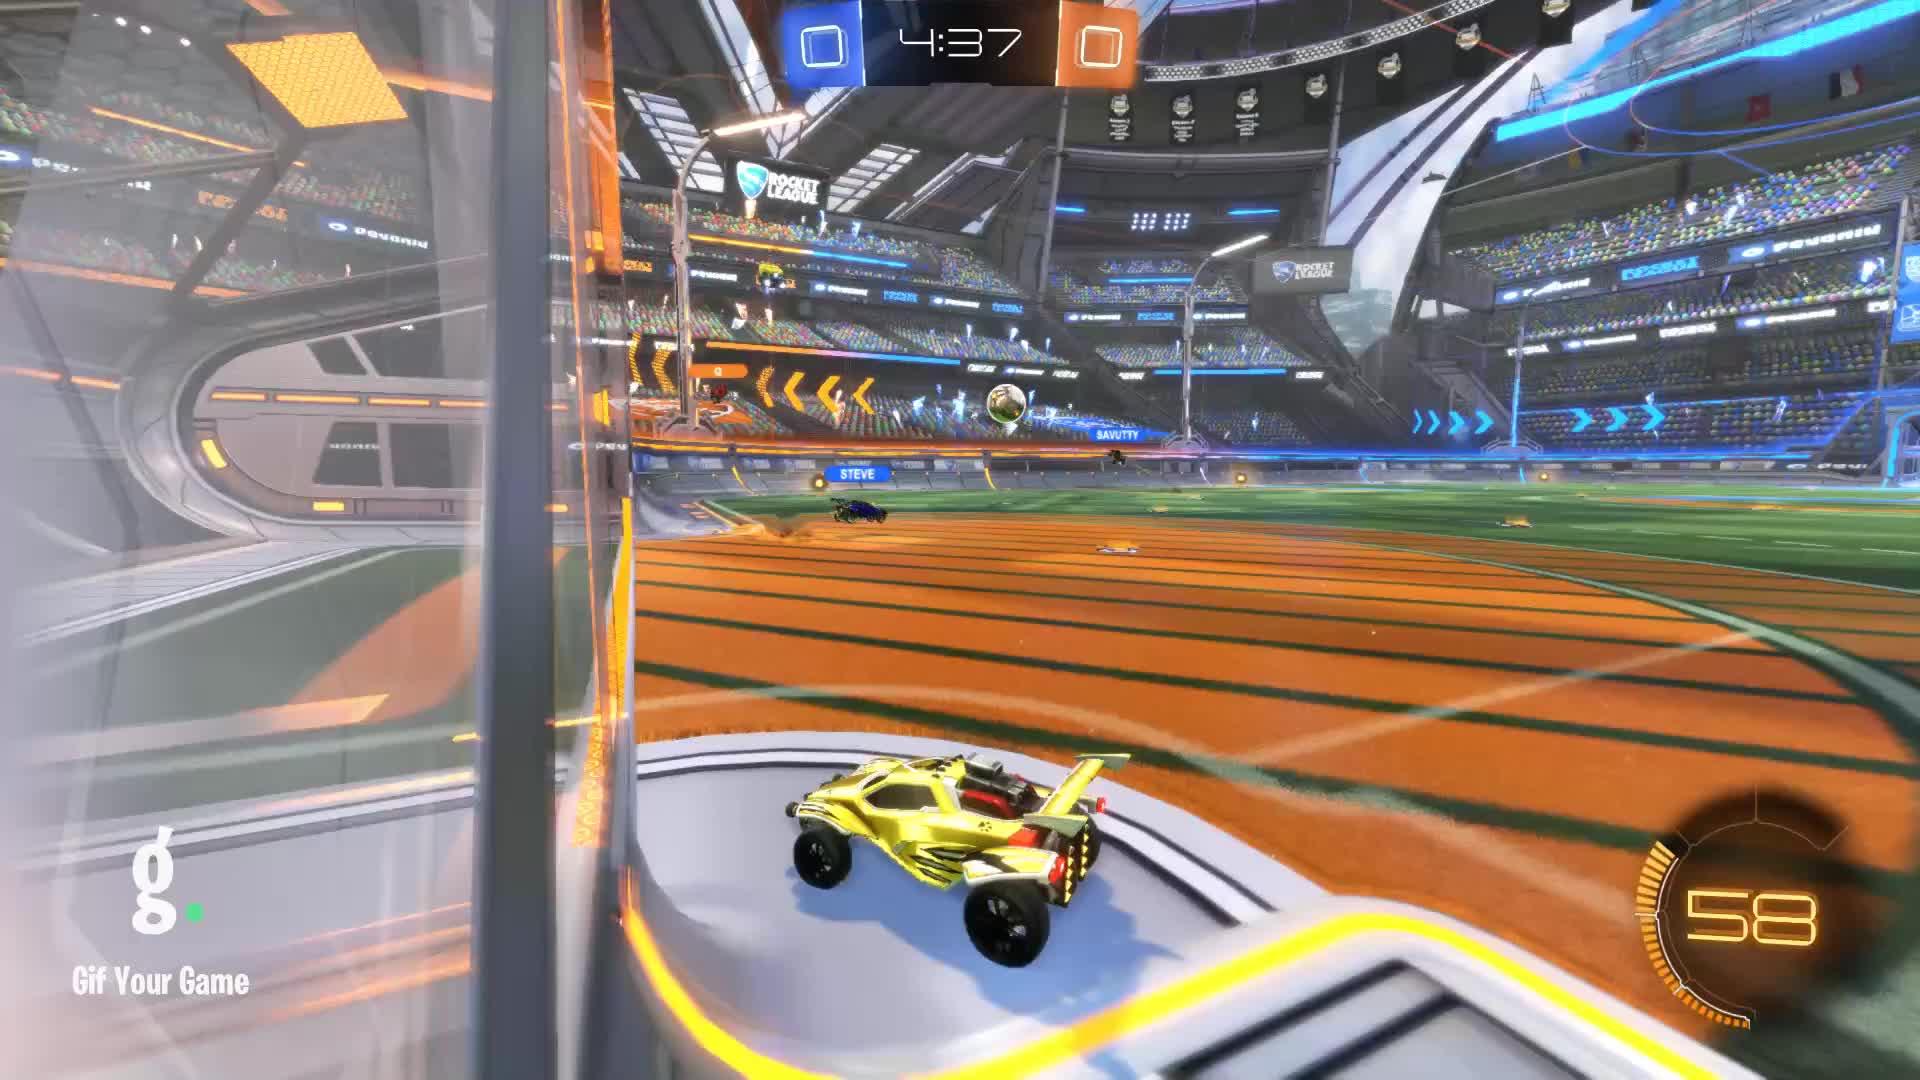 Gif Your Game, GifYourGame, Goal, Newt, Rocket League, RocketLeague, Goal 1: Newt GIFs